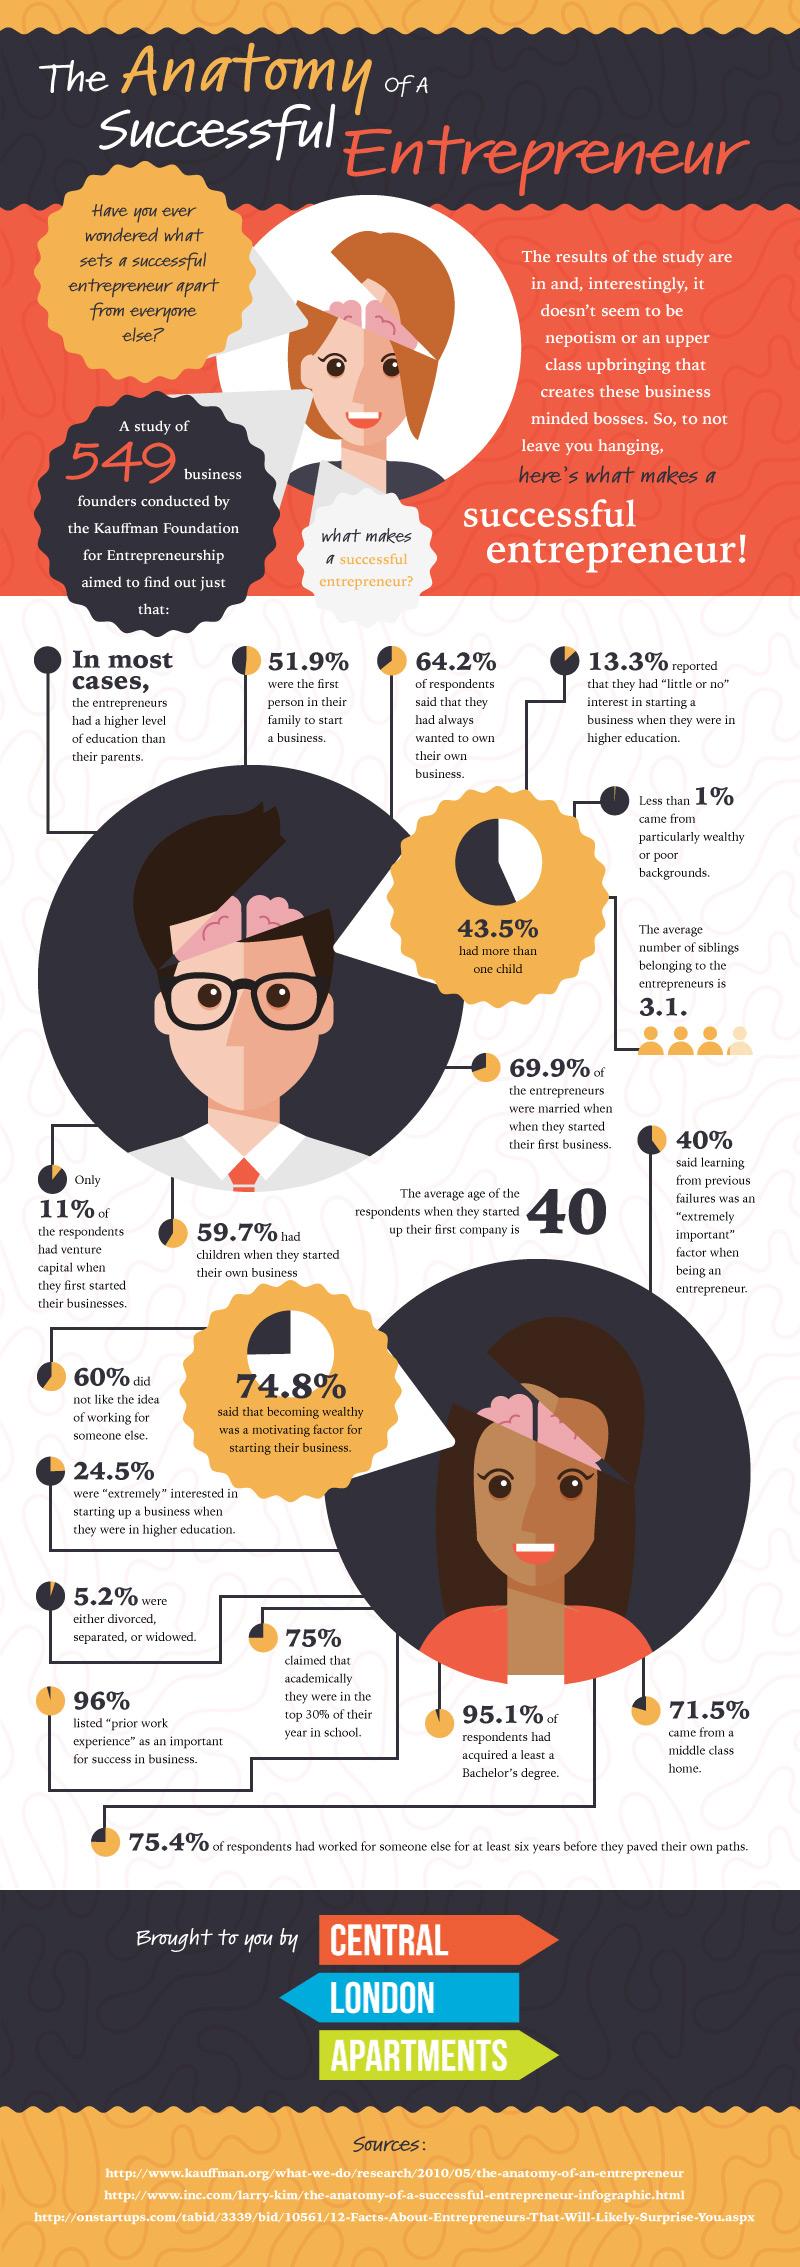 What Makes a Successful Entrepreneur?